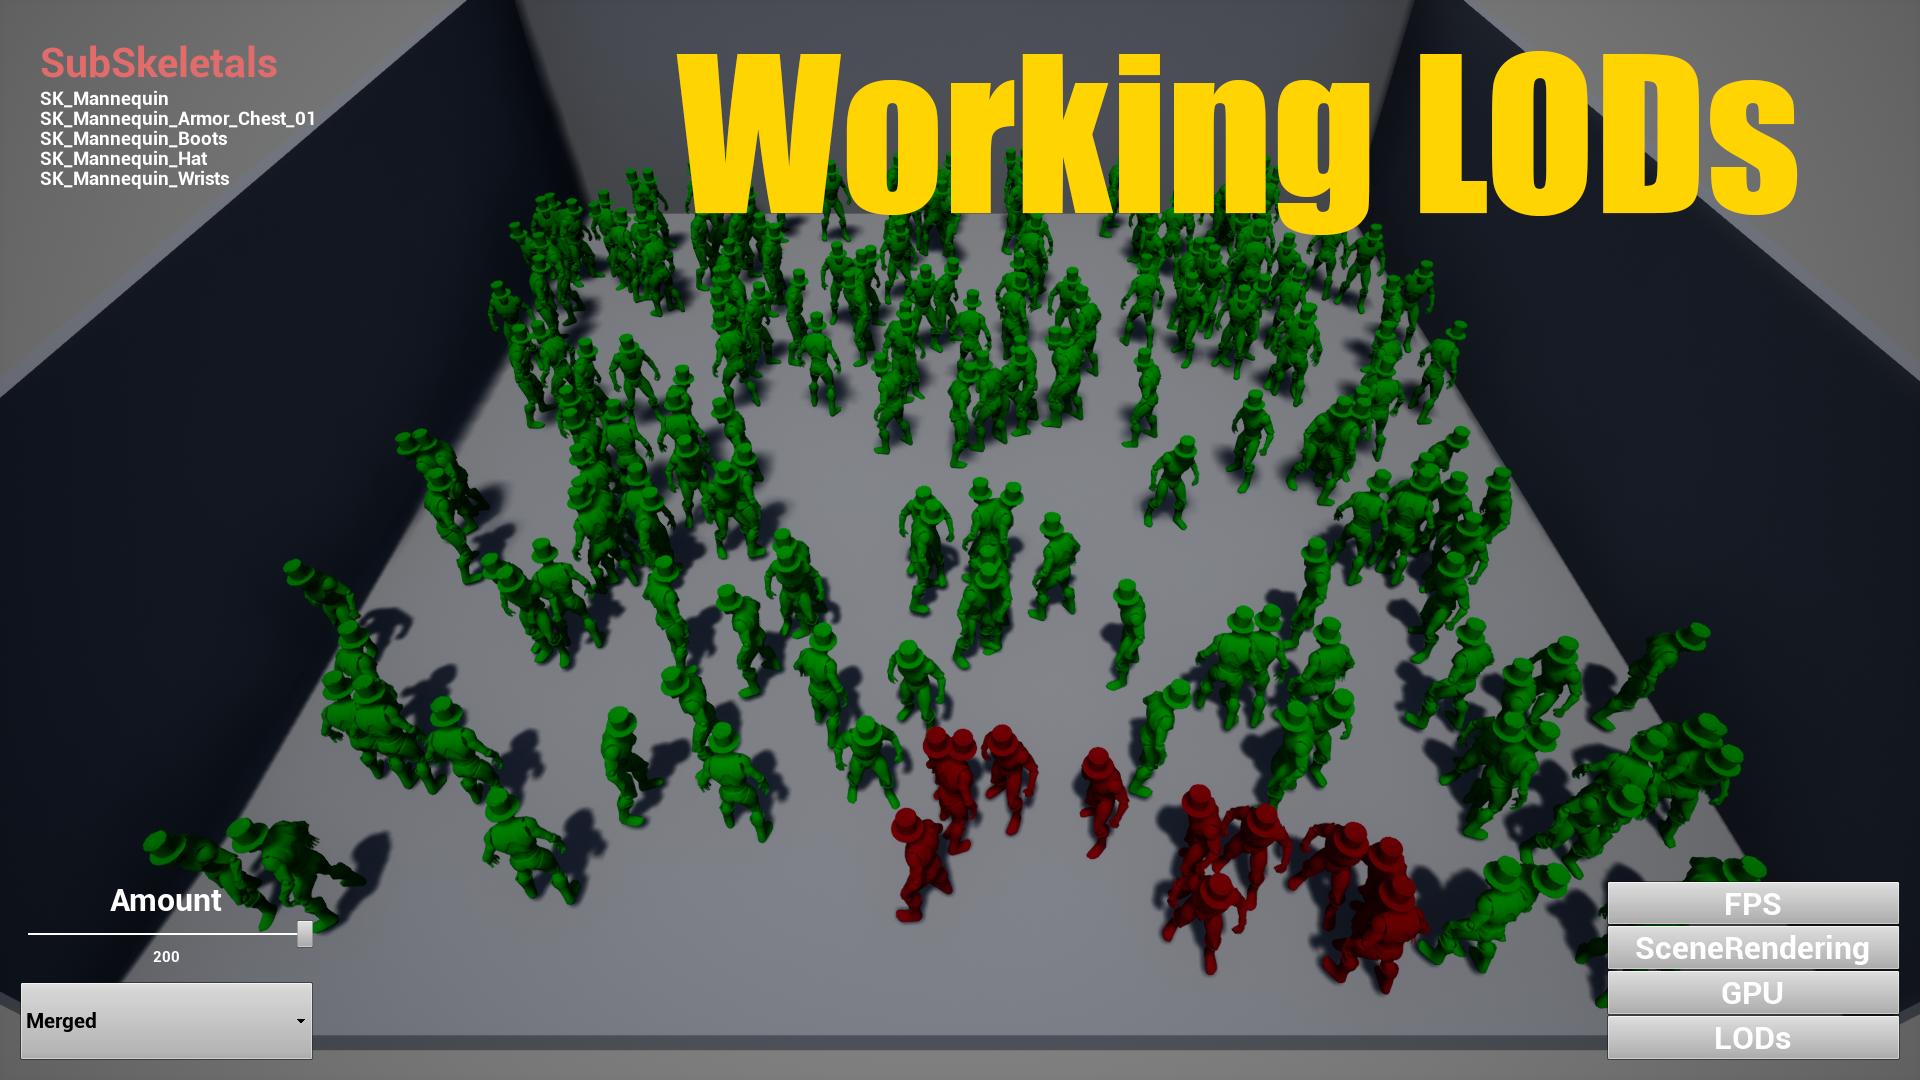 WorkingLods